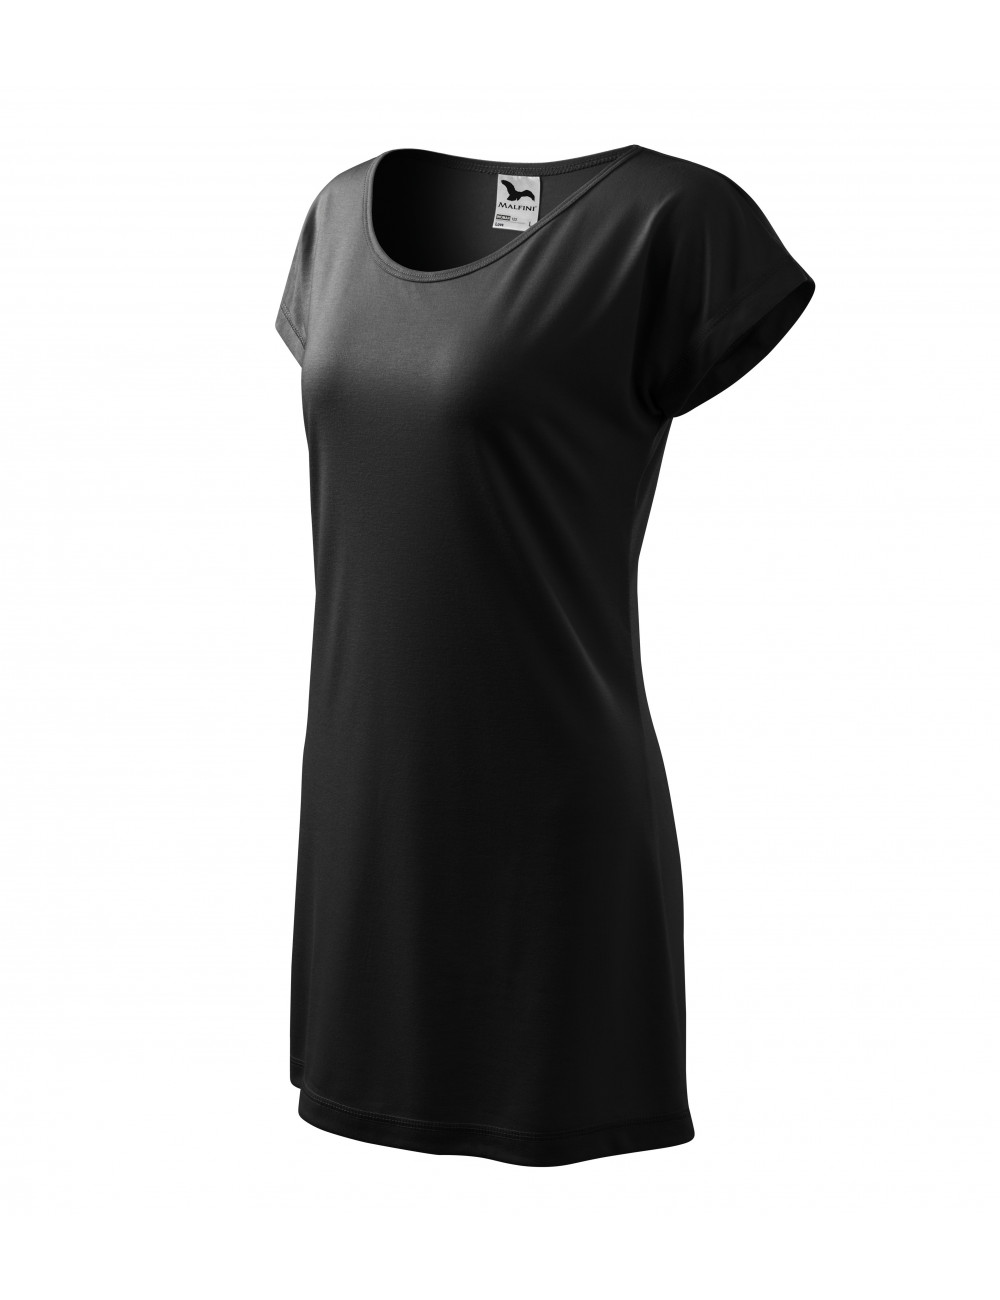 Adler MALFINI Koszulka/sukienka damska Love 123 czarny